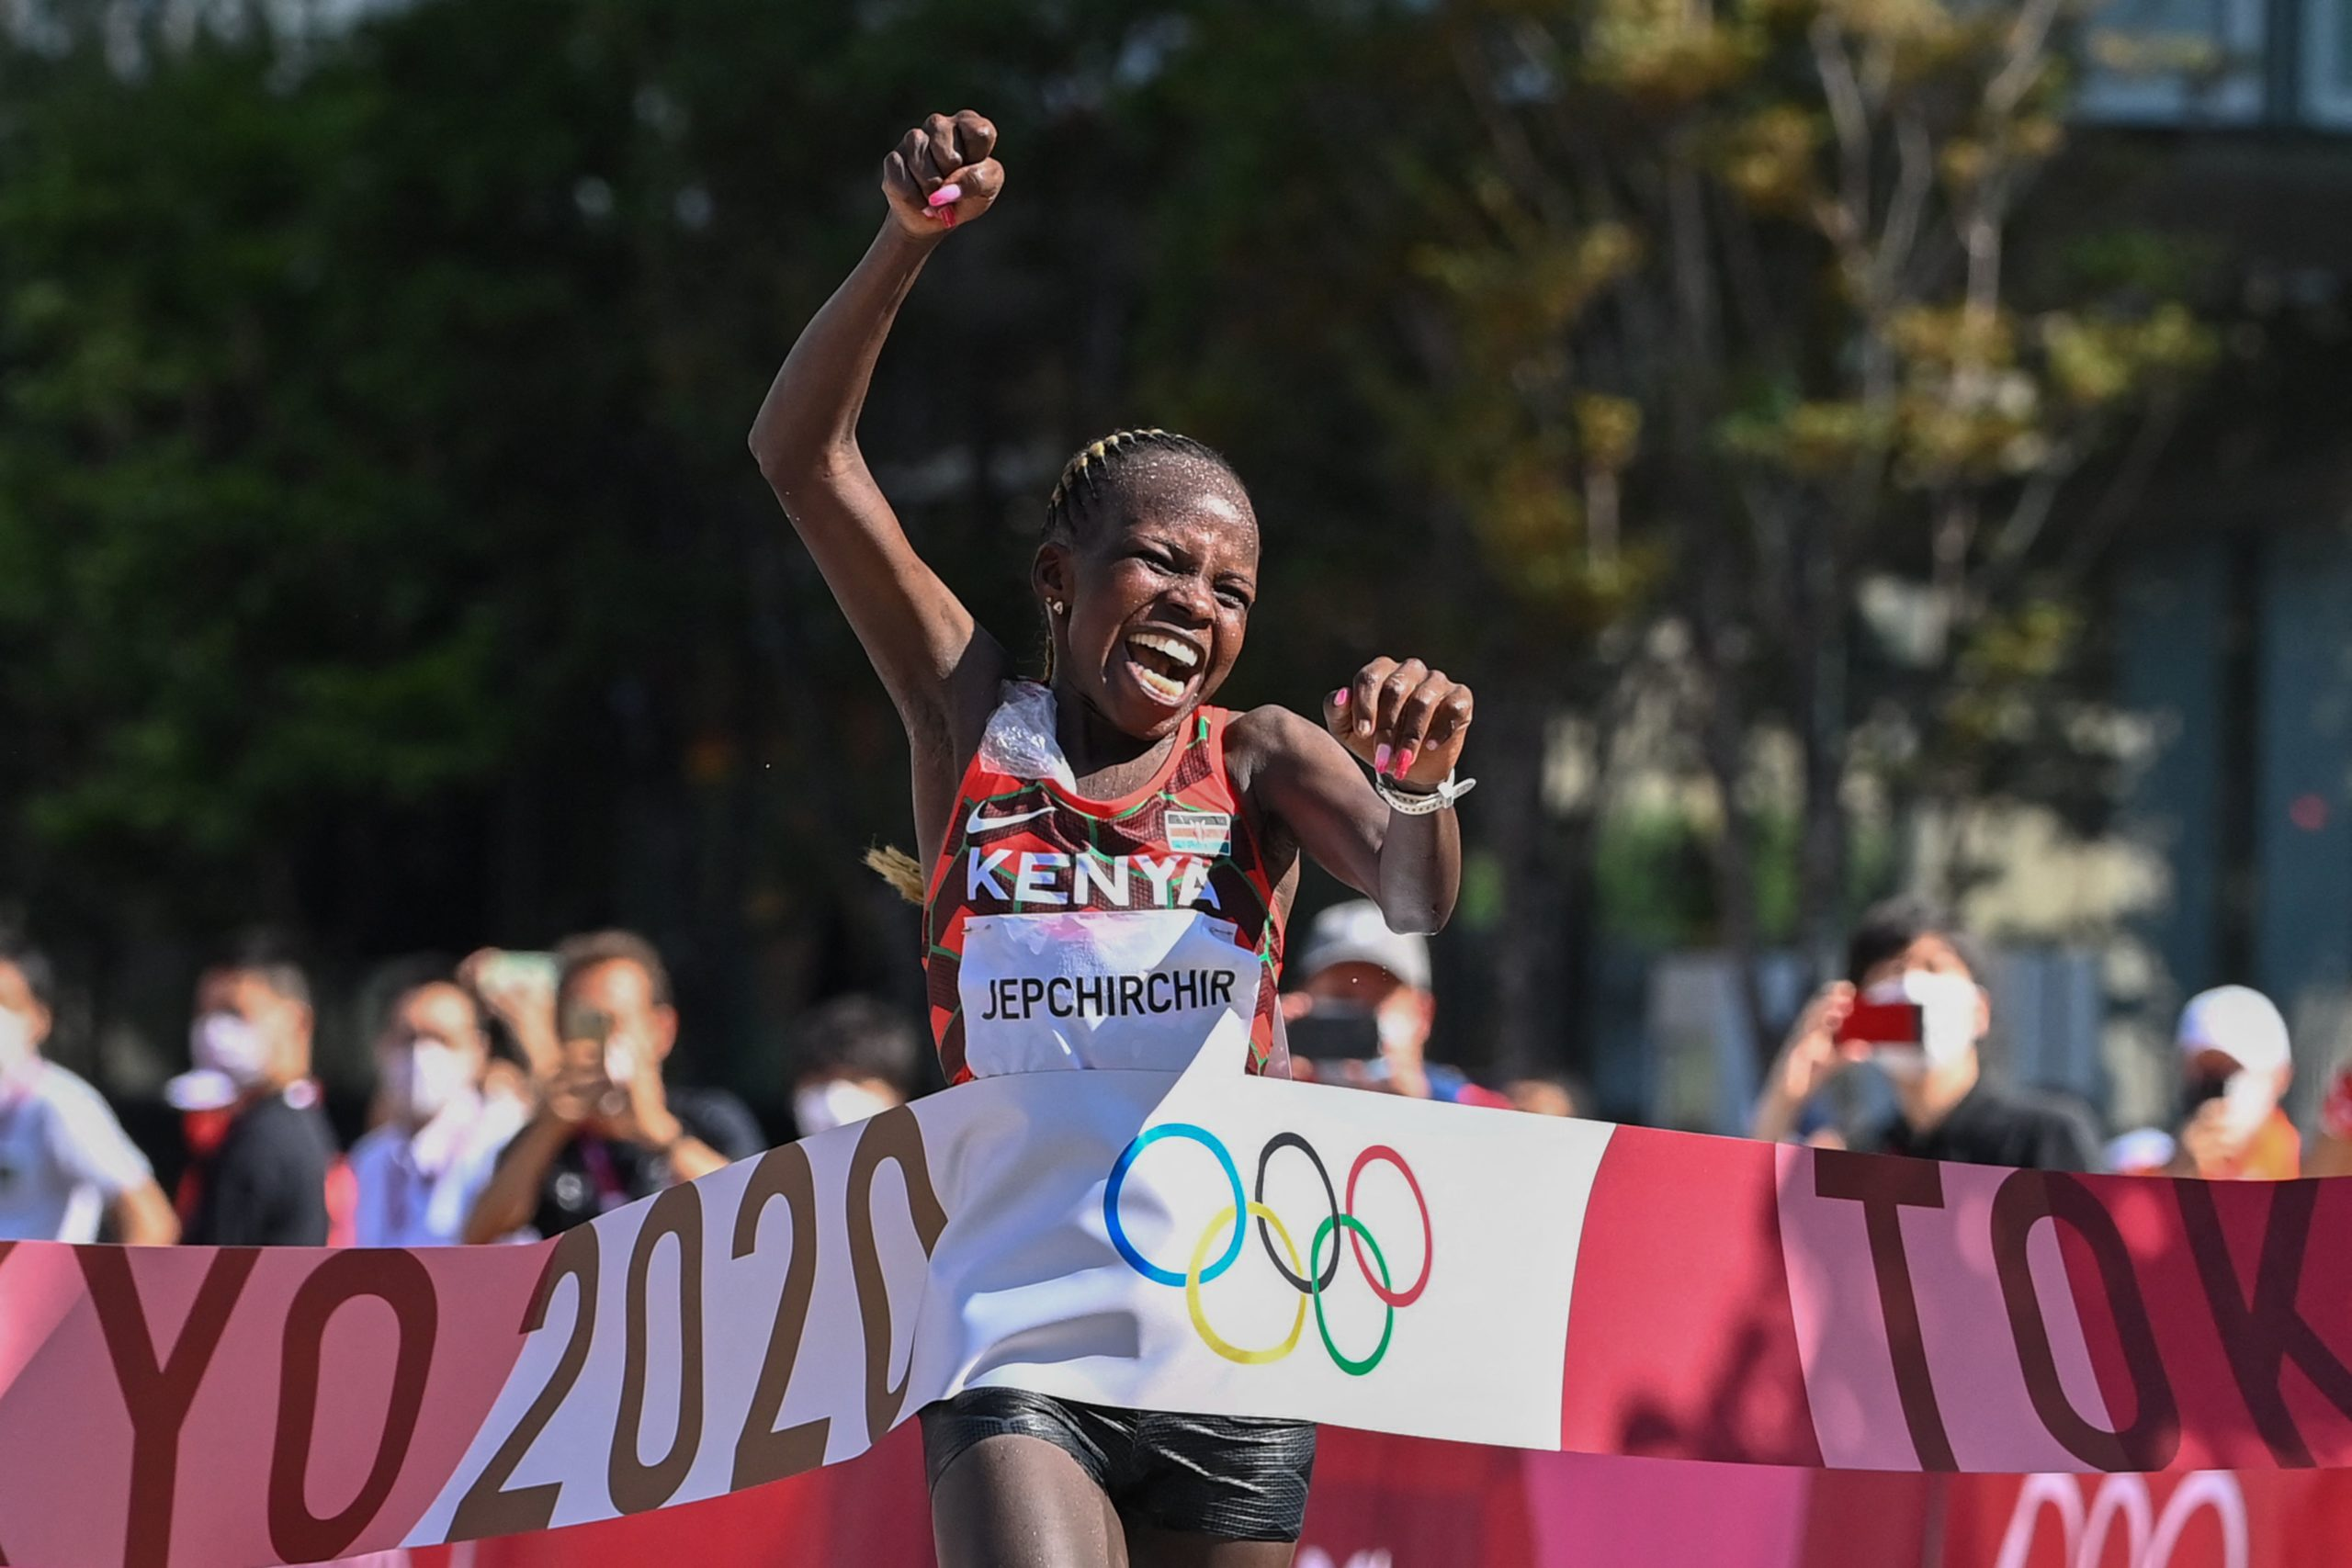 Tokyo Olympics: Jepchirchir, Kosgei clinch gold & silver in women's marathon